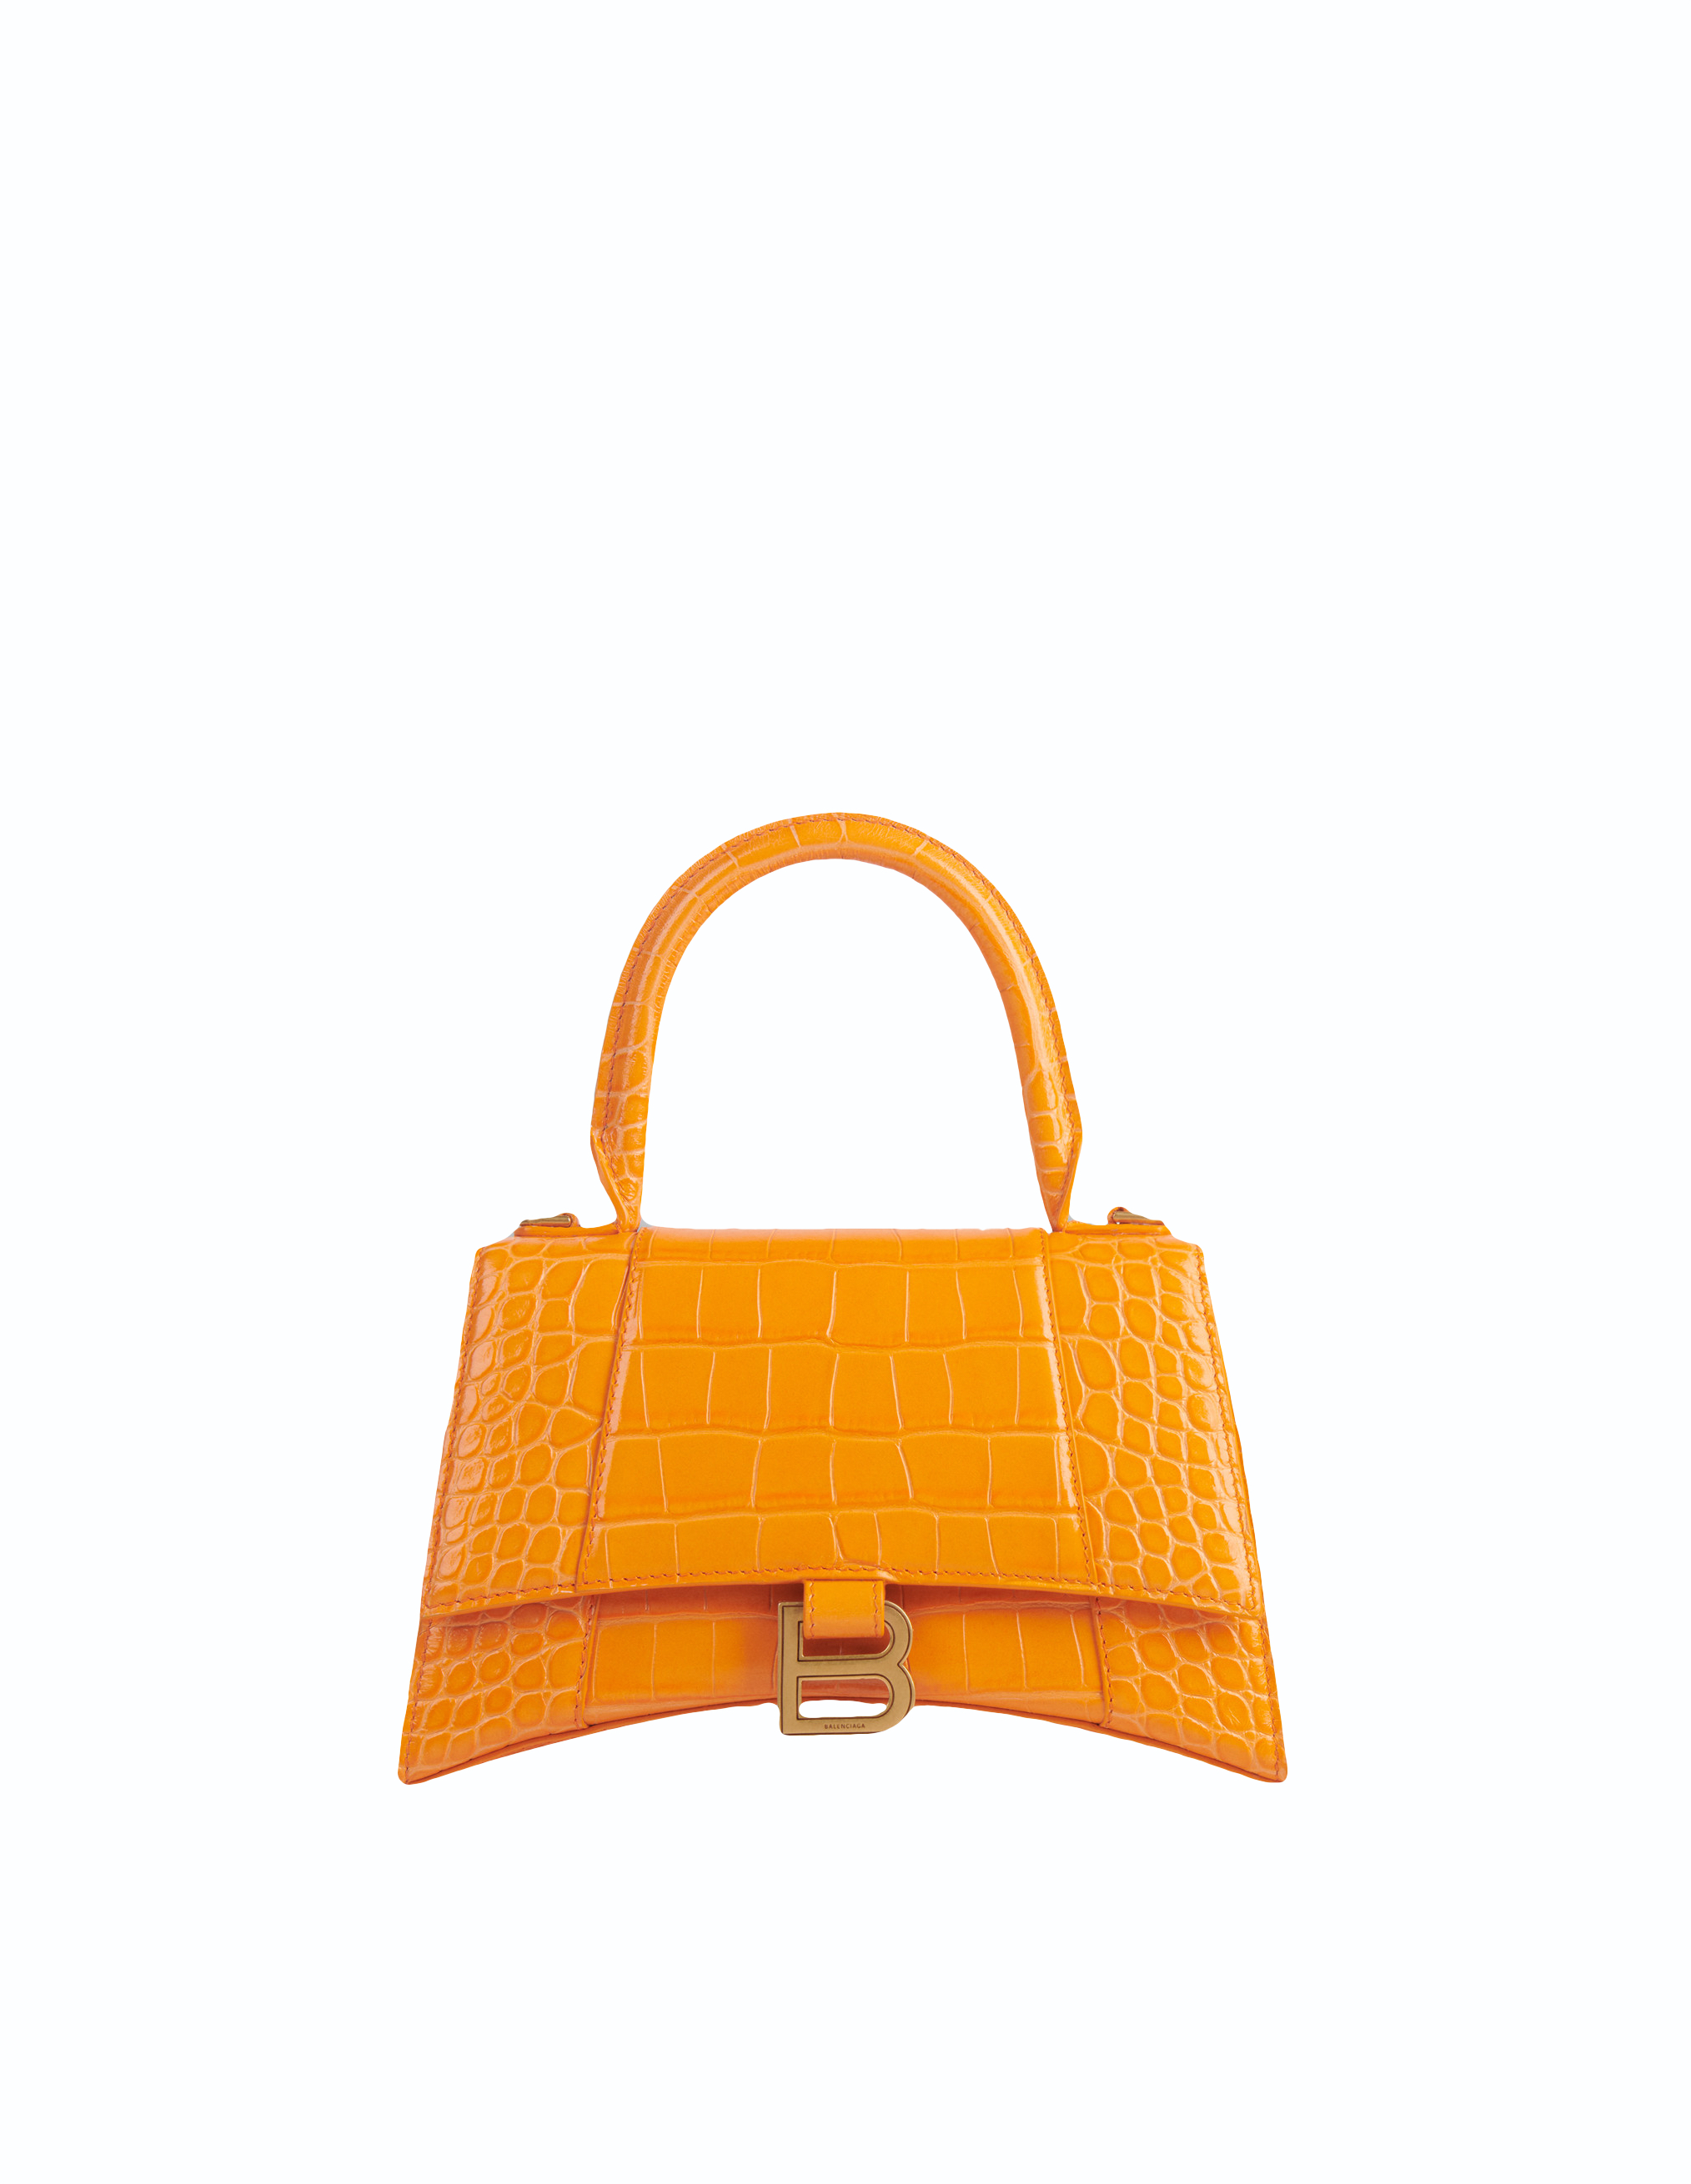 Balenciaga Orange Small Hourglass Top Handle Bag